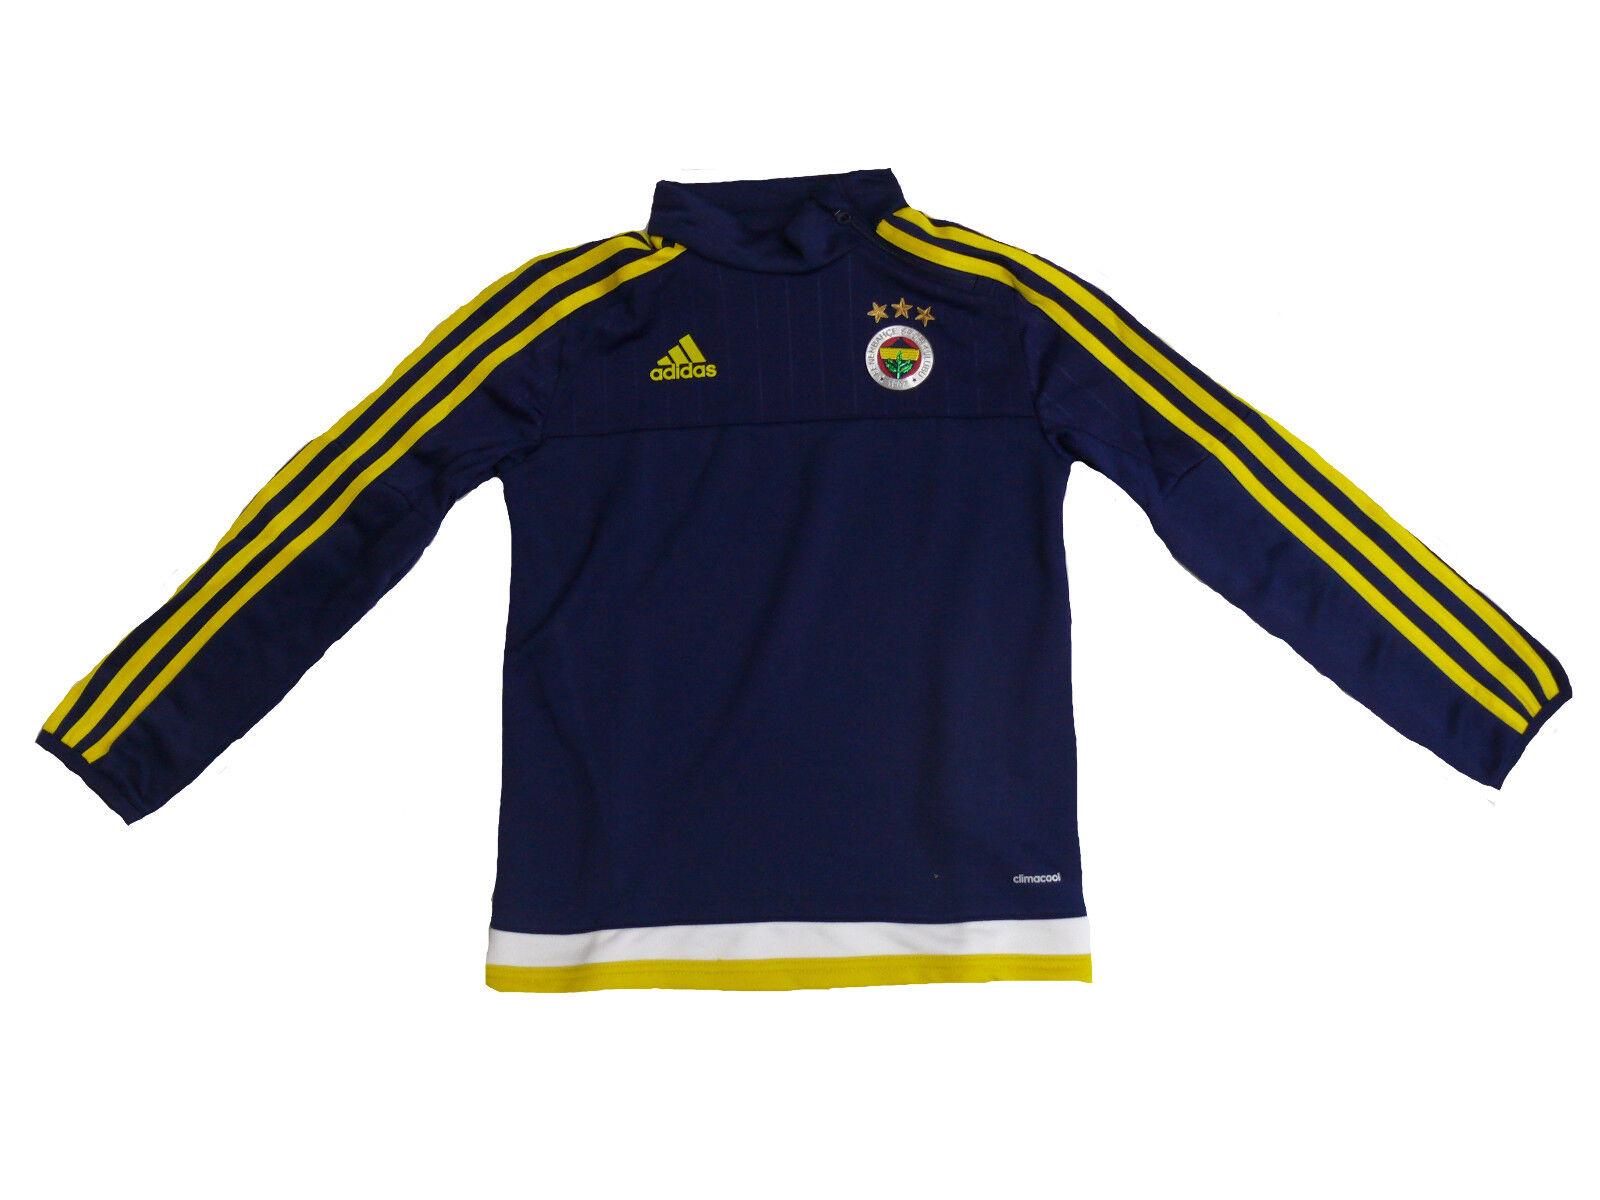 Adidas Fenerbahce Istanbul Kinder Sweatshirt trainings Top  Gr.164